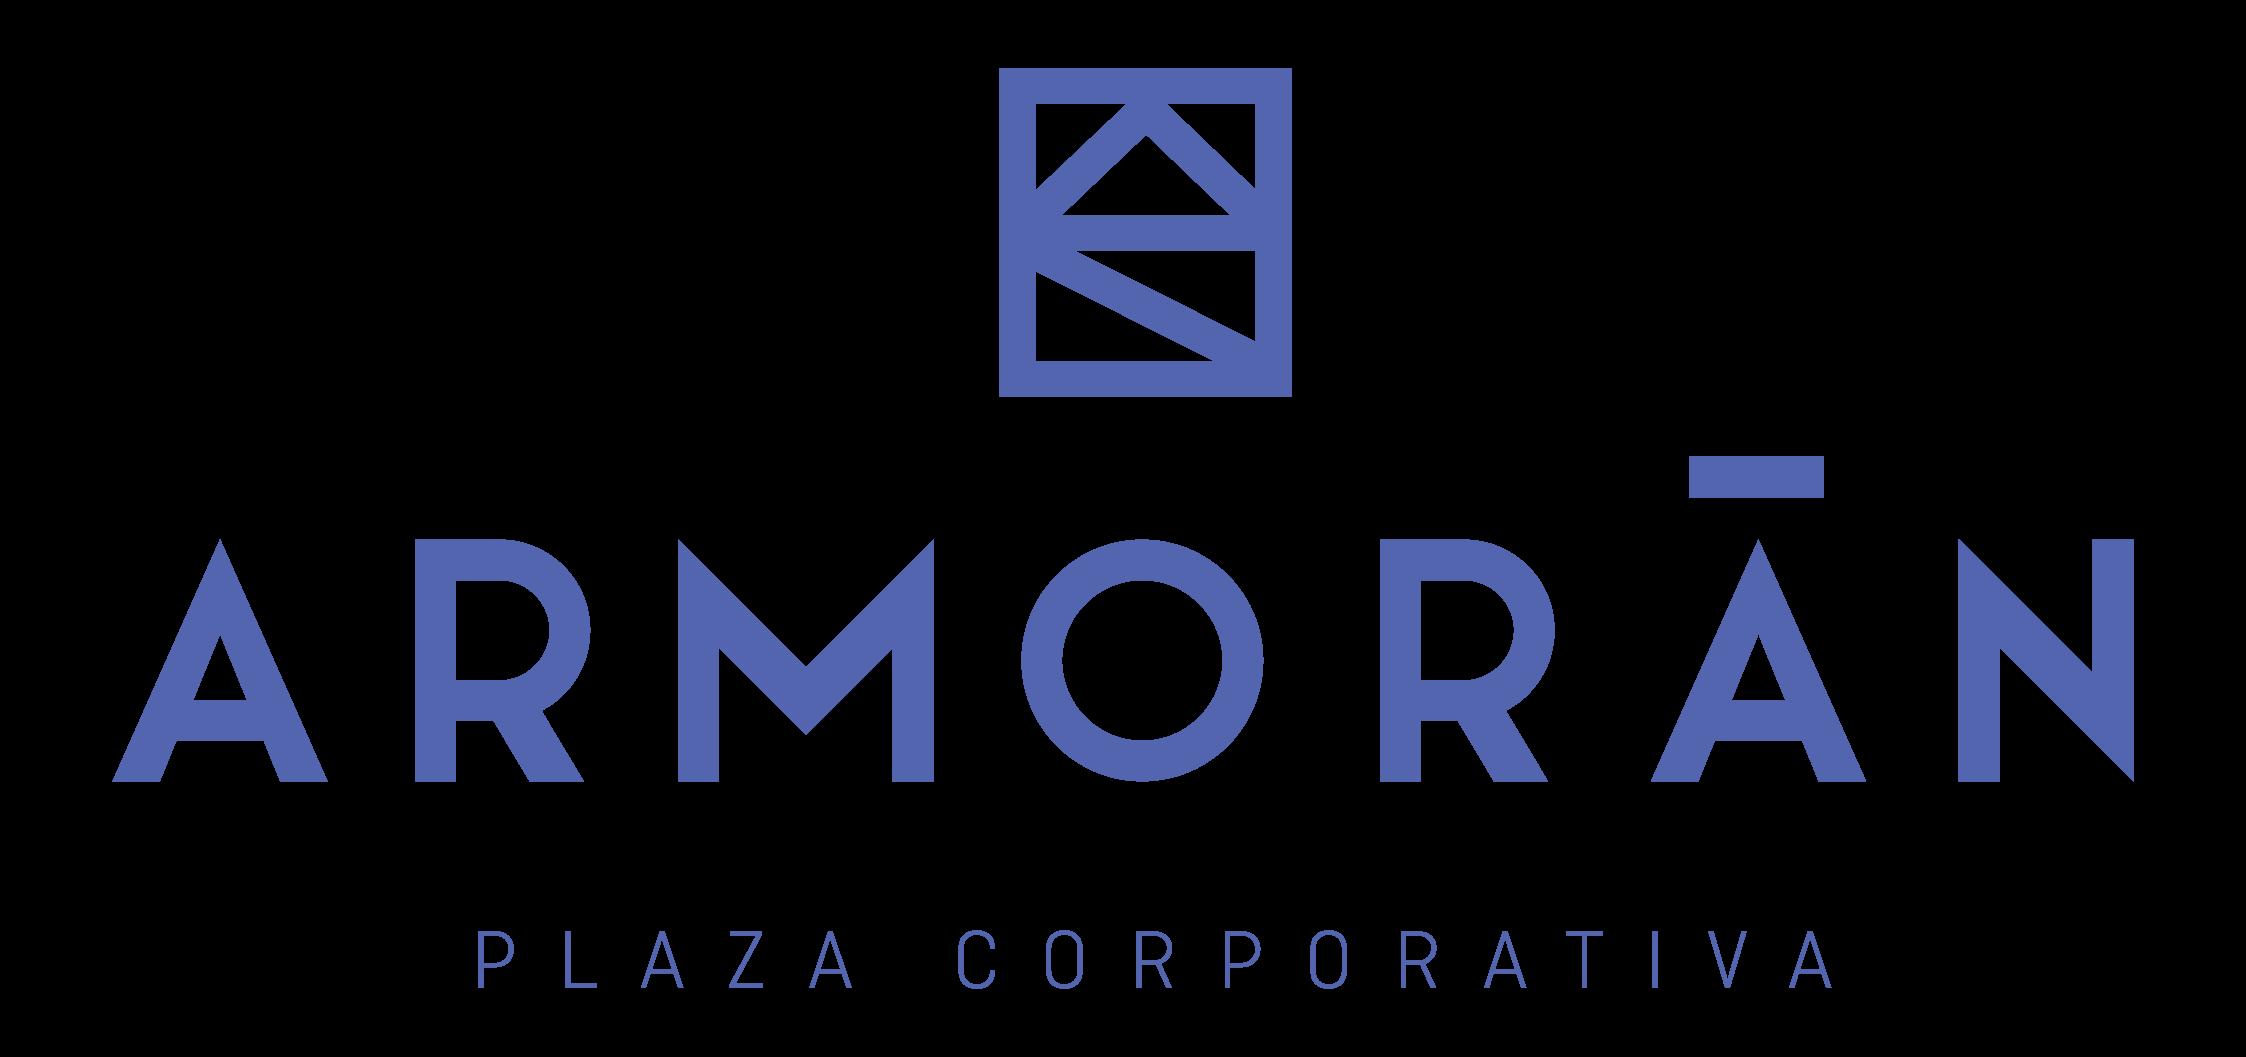 Armoran-logo